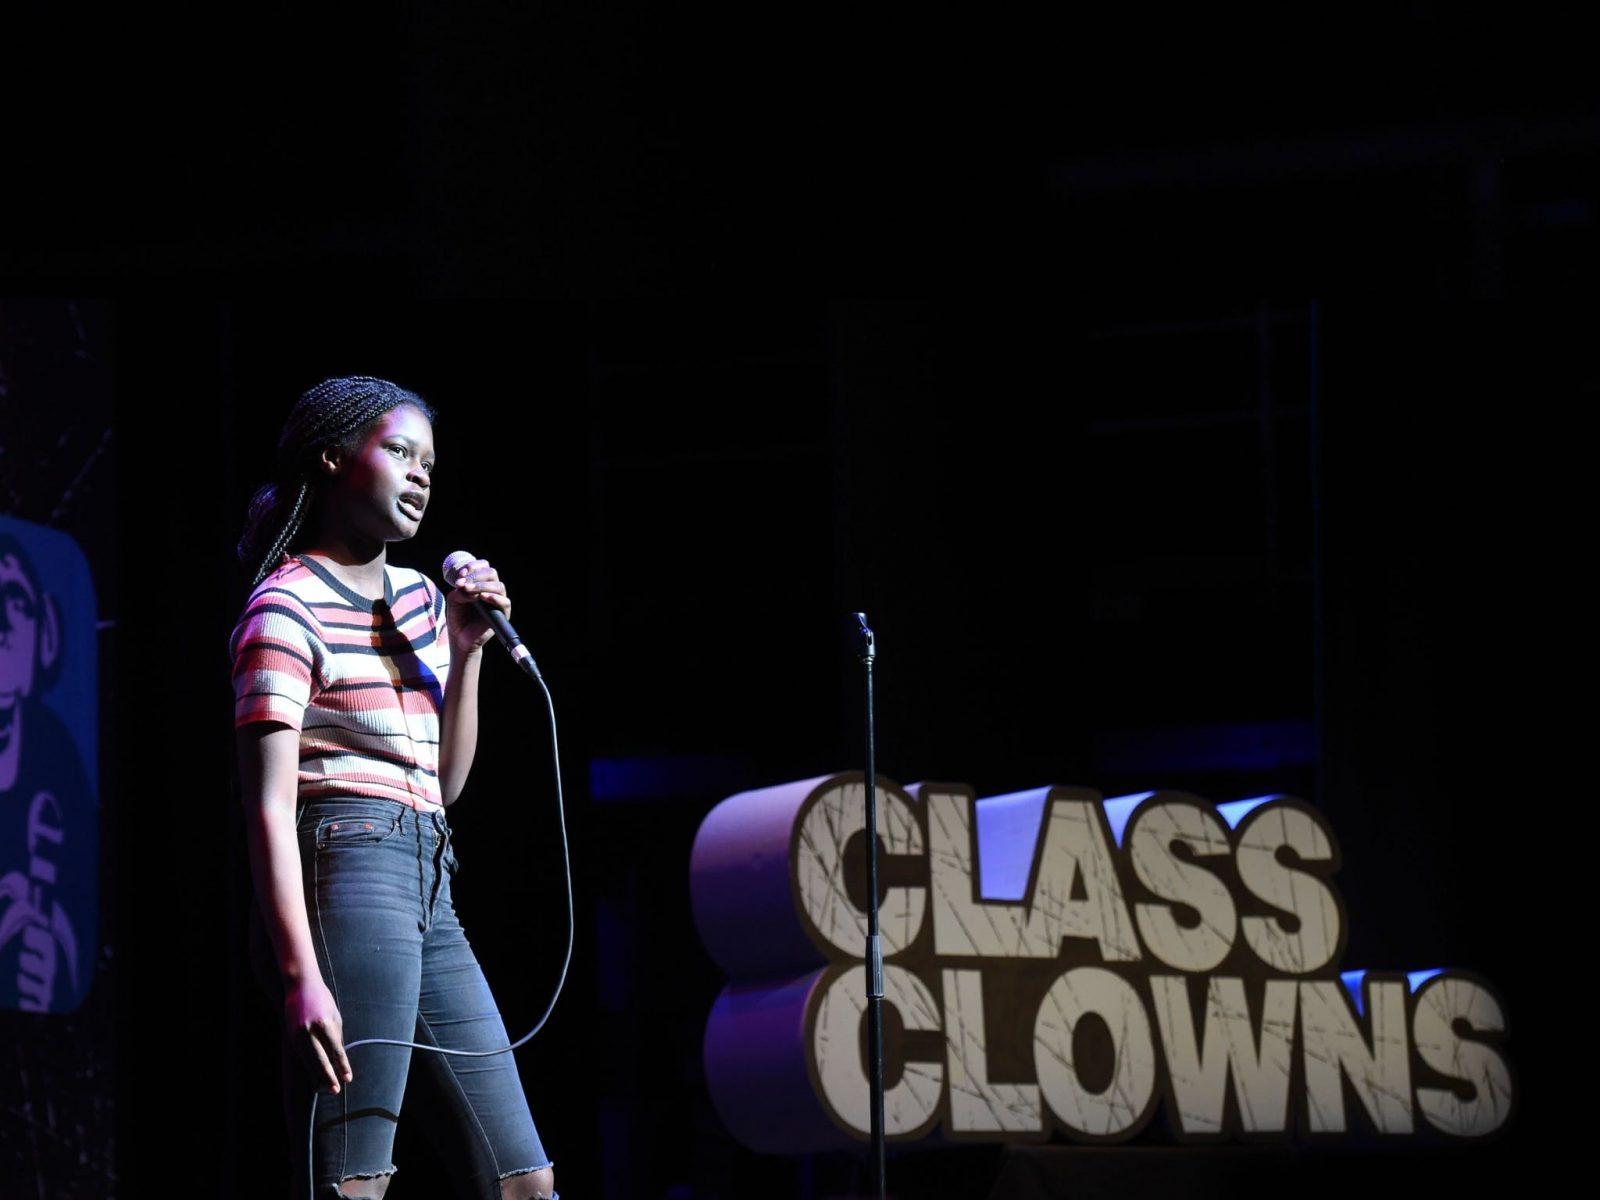 Class Clowns - Wollongong Heat